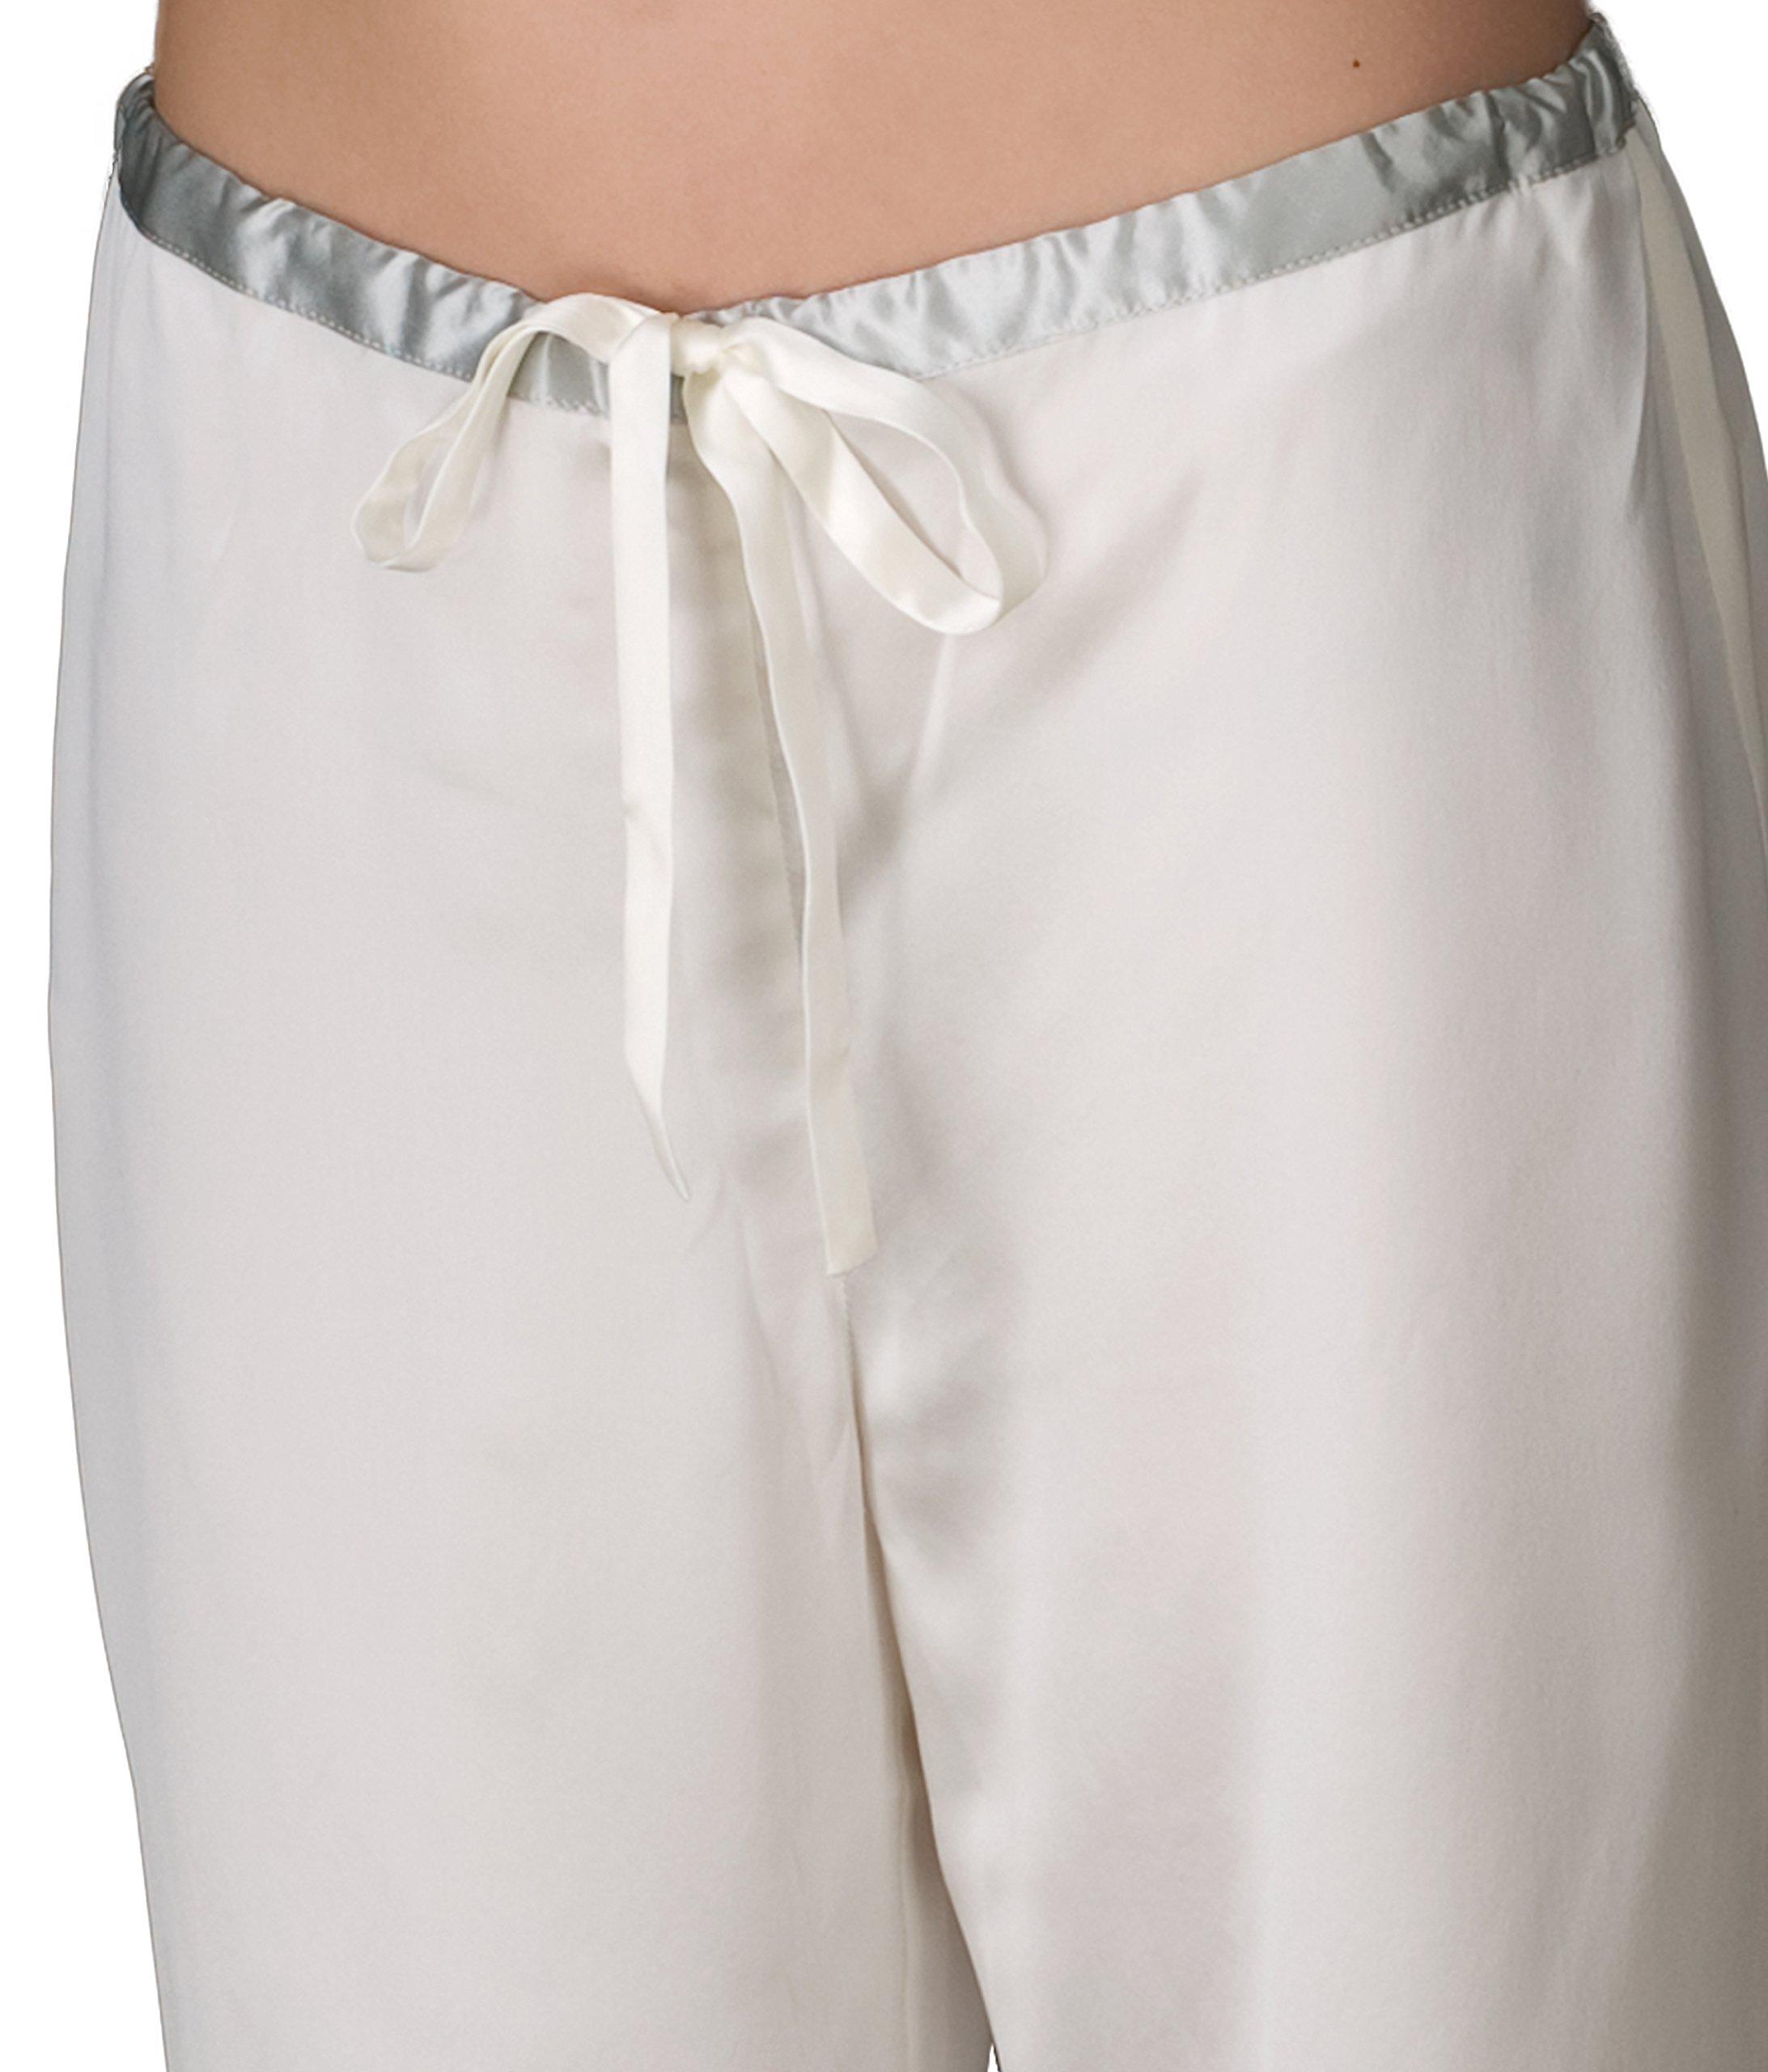 Julianna Rae Women's 100% Silk Pajama, Classic Fit, Evening Lounge, Alabaster, Petite, M by Julianna Rae (Image #4)